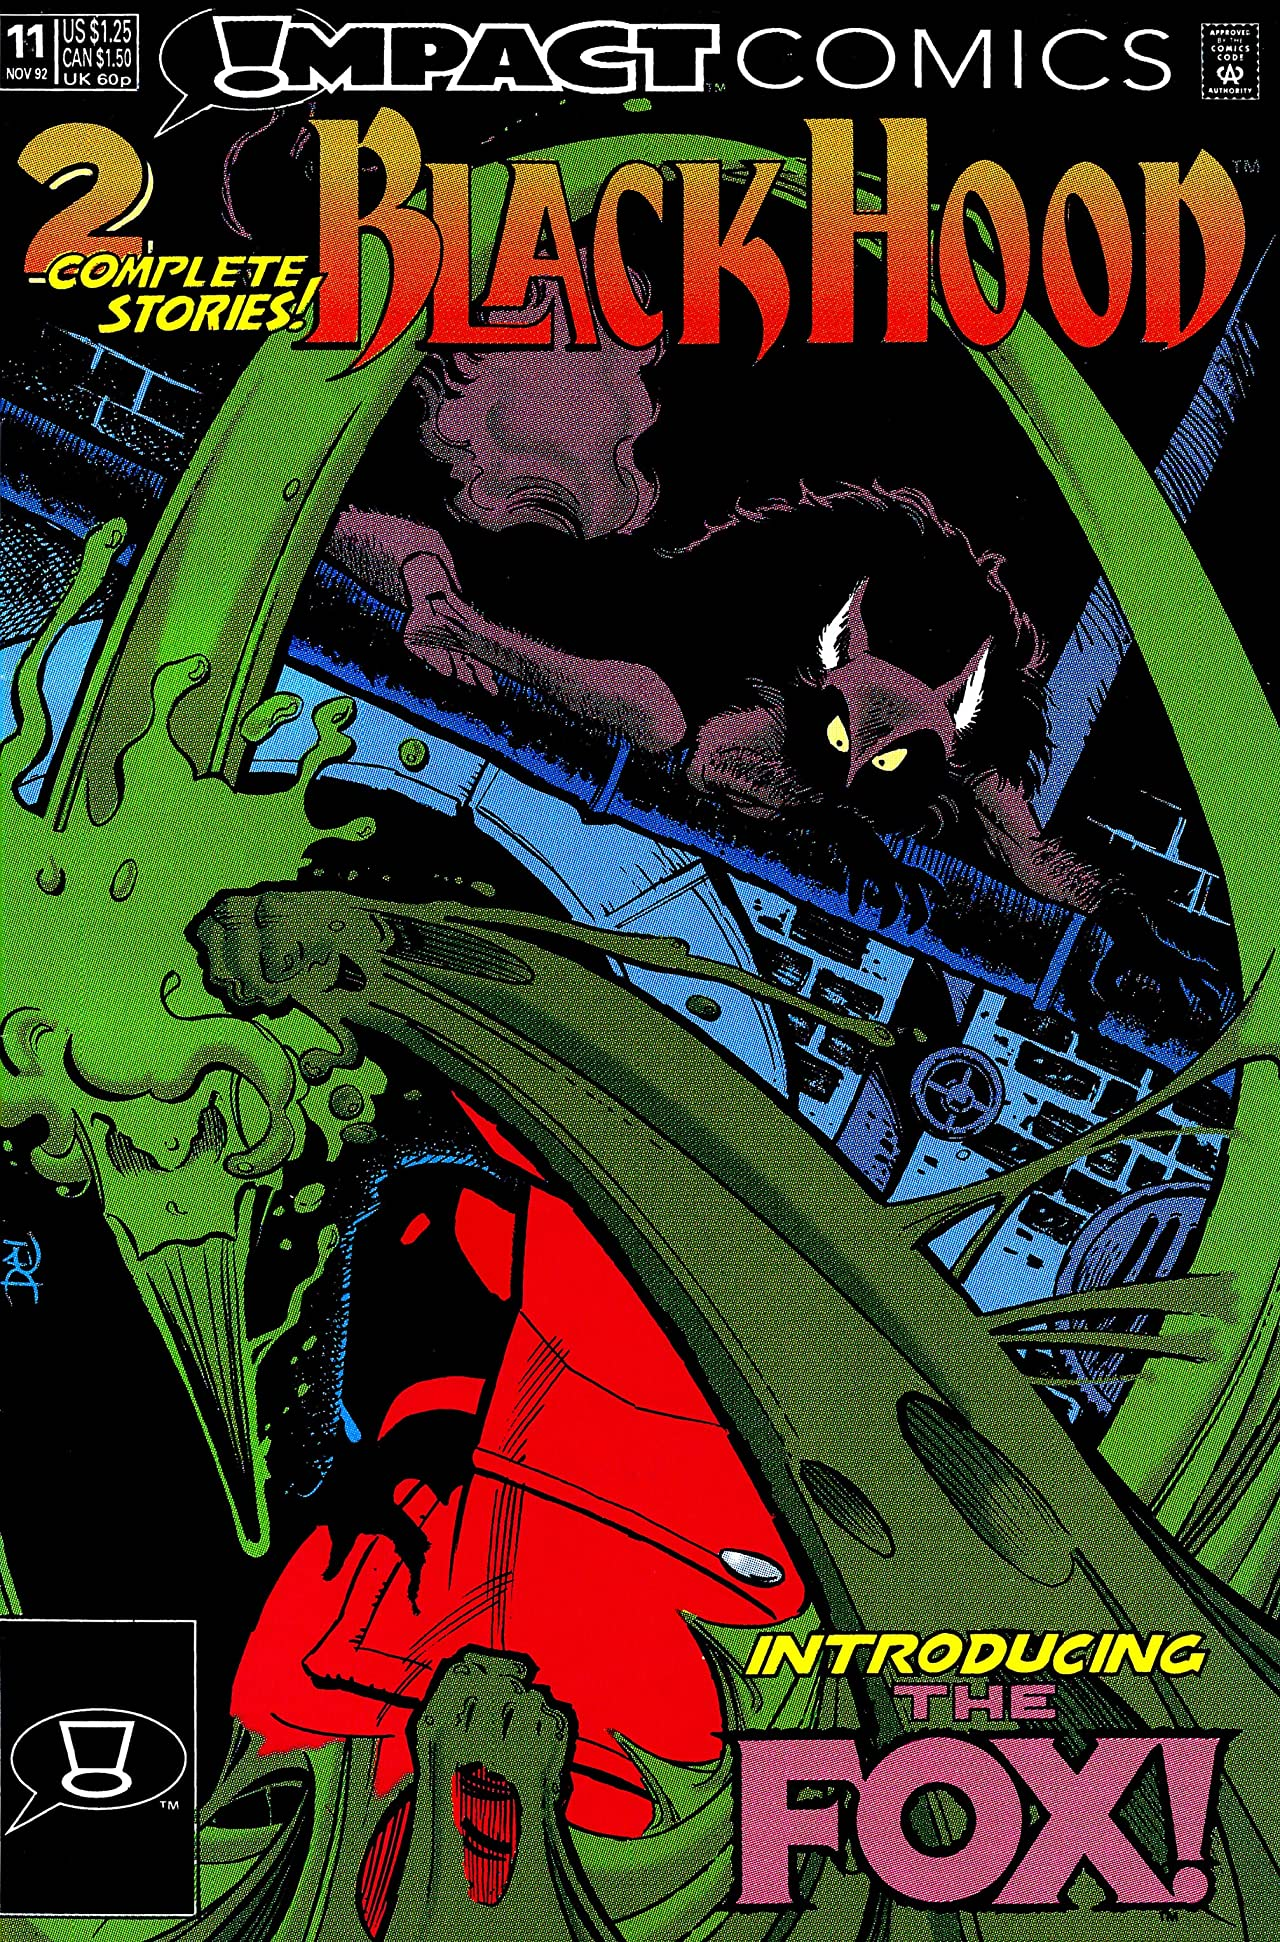 The Black Hood (Impact Comics) #11